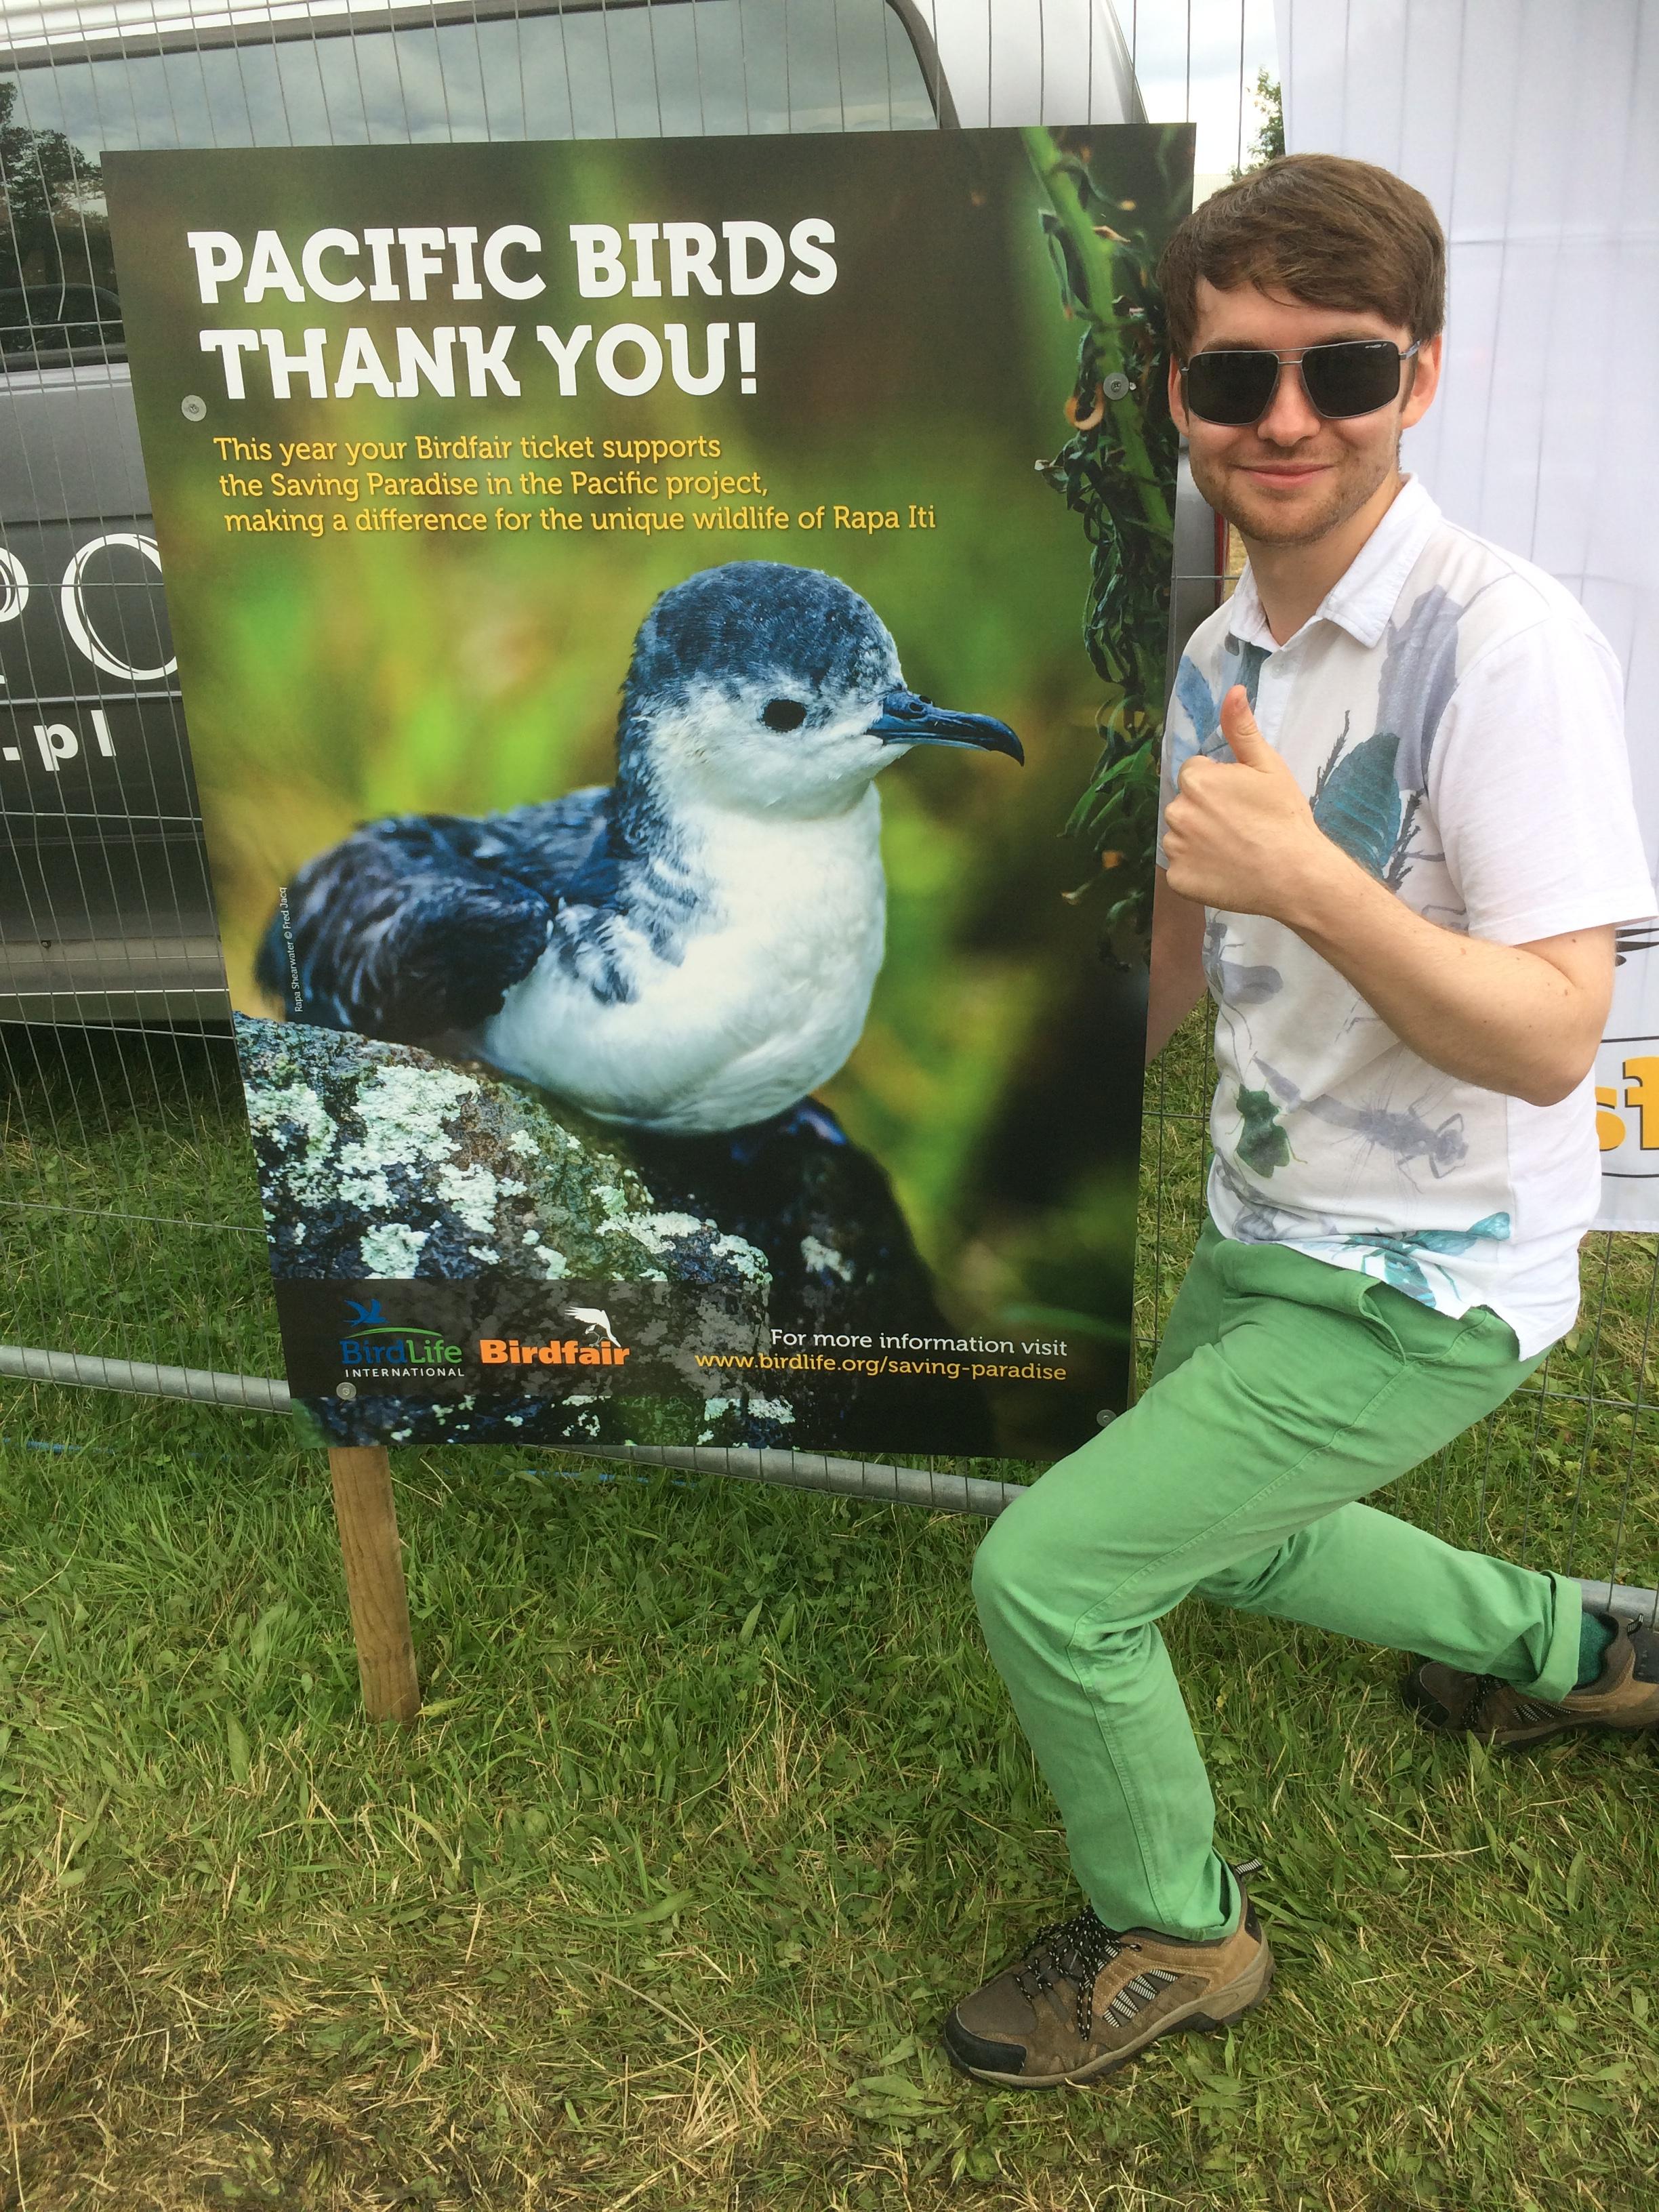 Pacific Birds Thank You